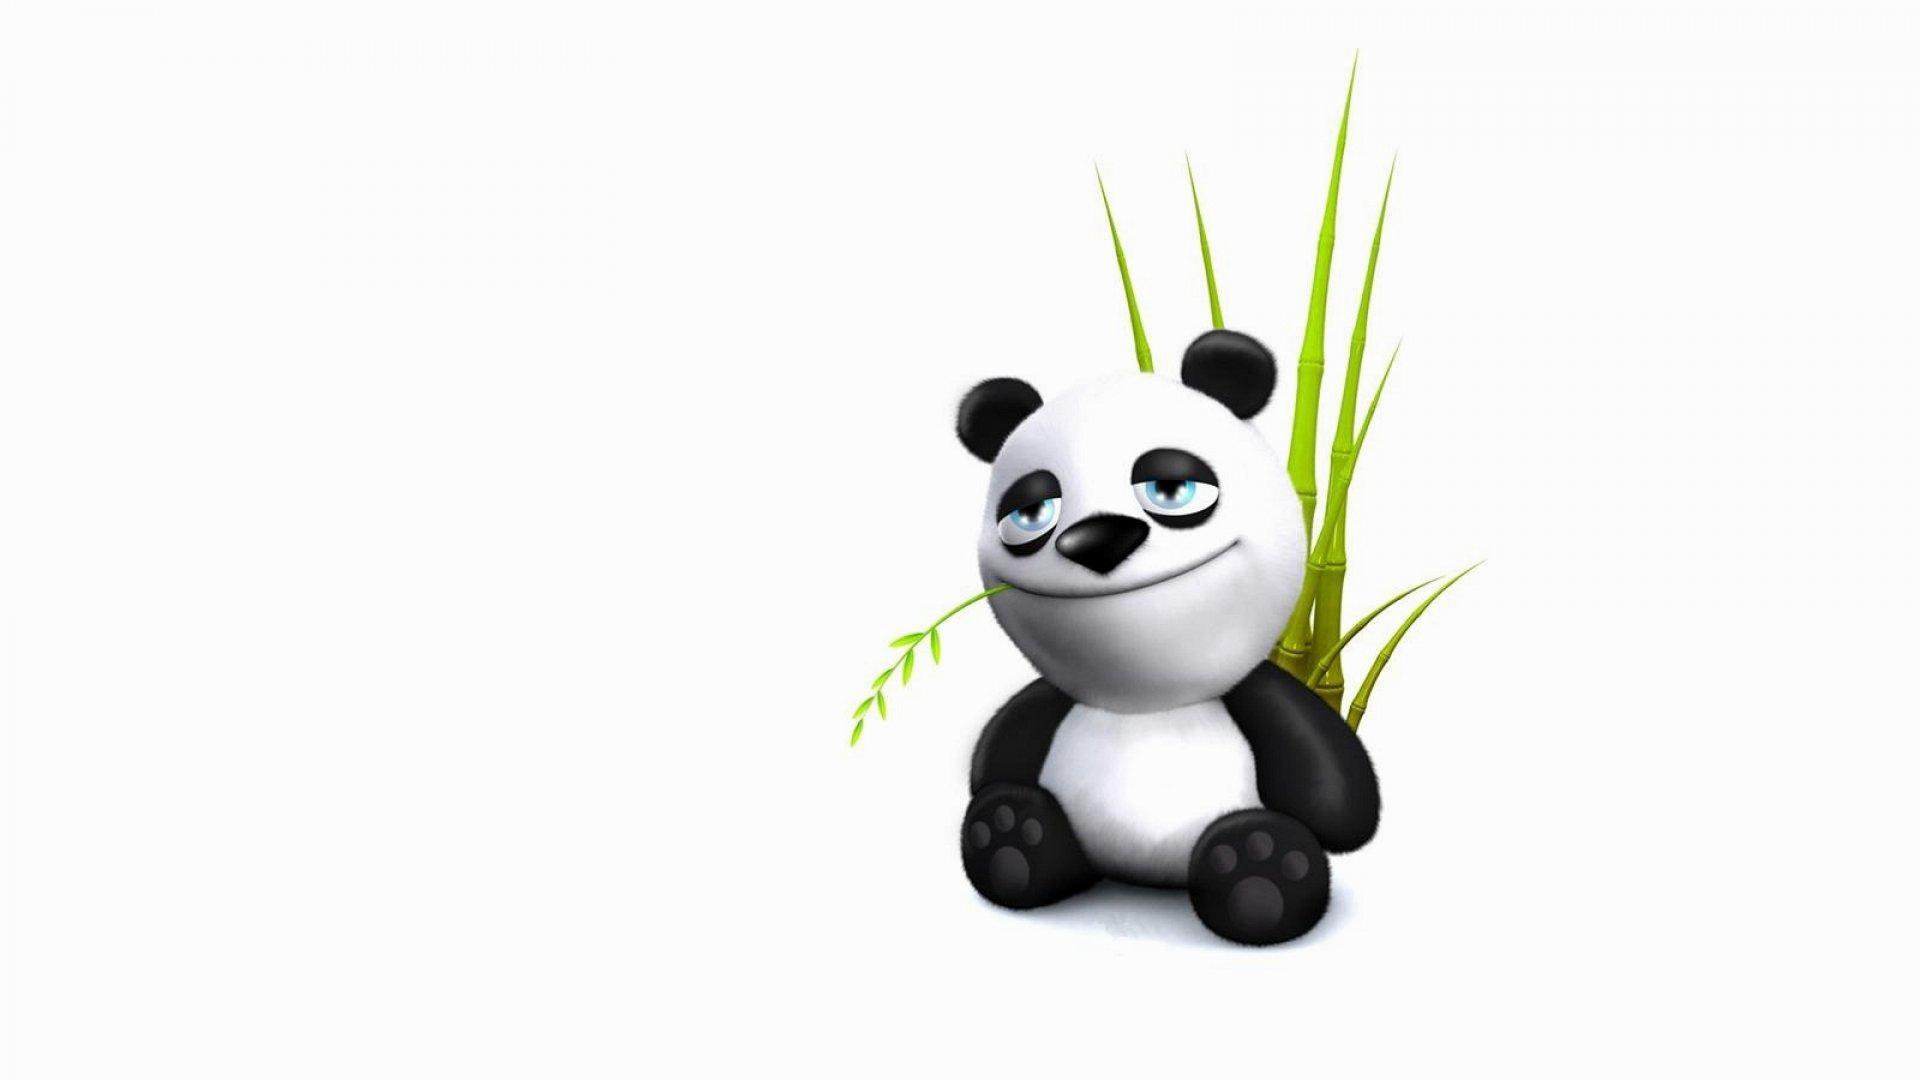 wallpaper.wiki-Funny-3D-Cartoon-Panda-Background-PIC-